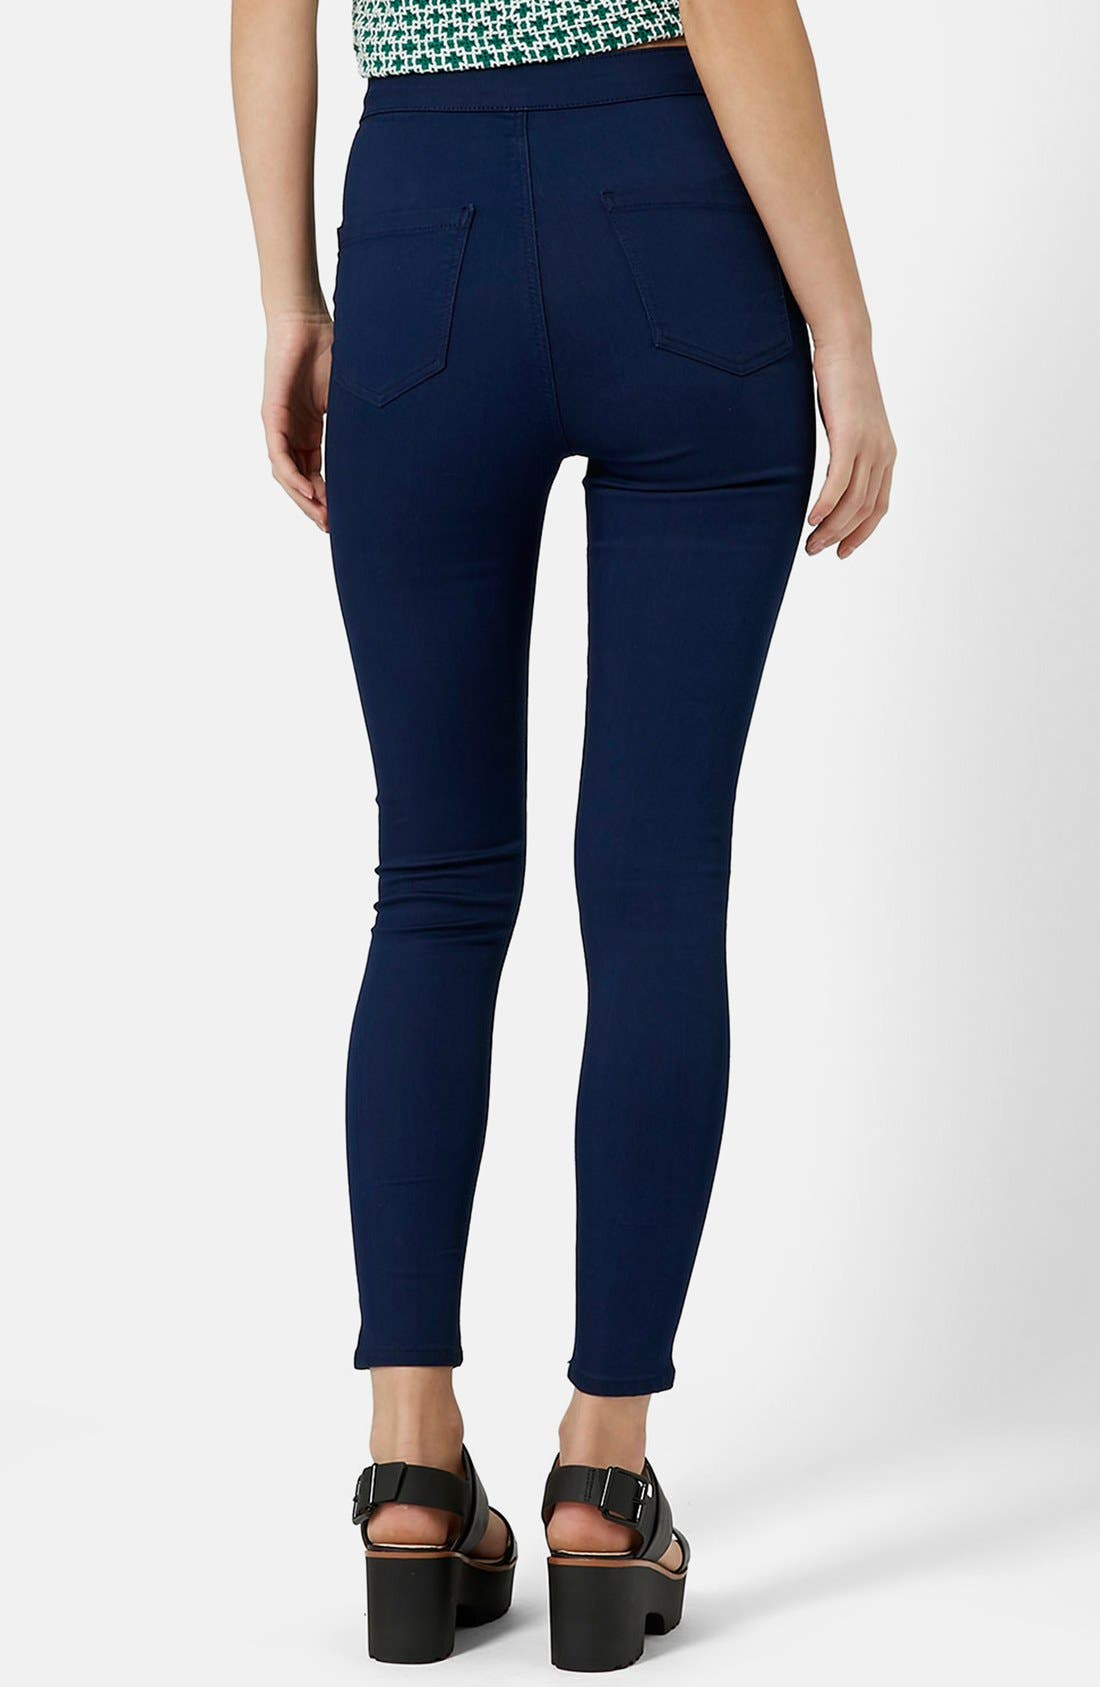 Alternate Image 2  - Topshop Moto 'Joni' High Rise Skinny Jeans (Bright Blue)